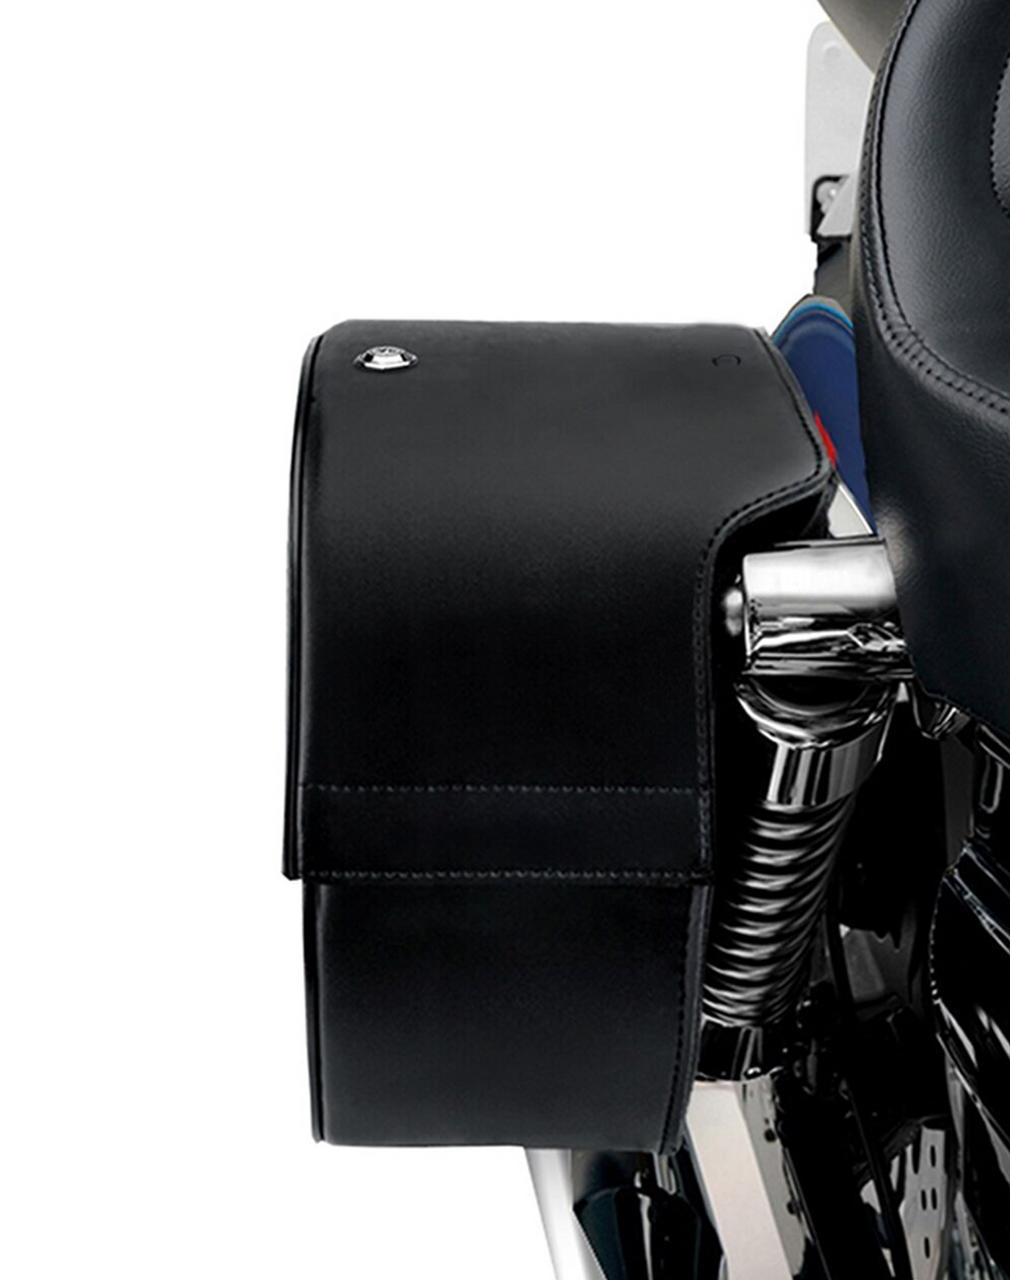 Kawasaki Vulcan 750 Shock Cutout Slanted Studded Large Motorcycle Saddlebags Shock Cutout View